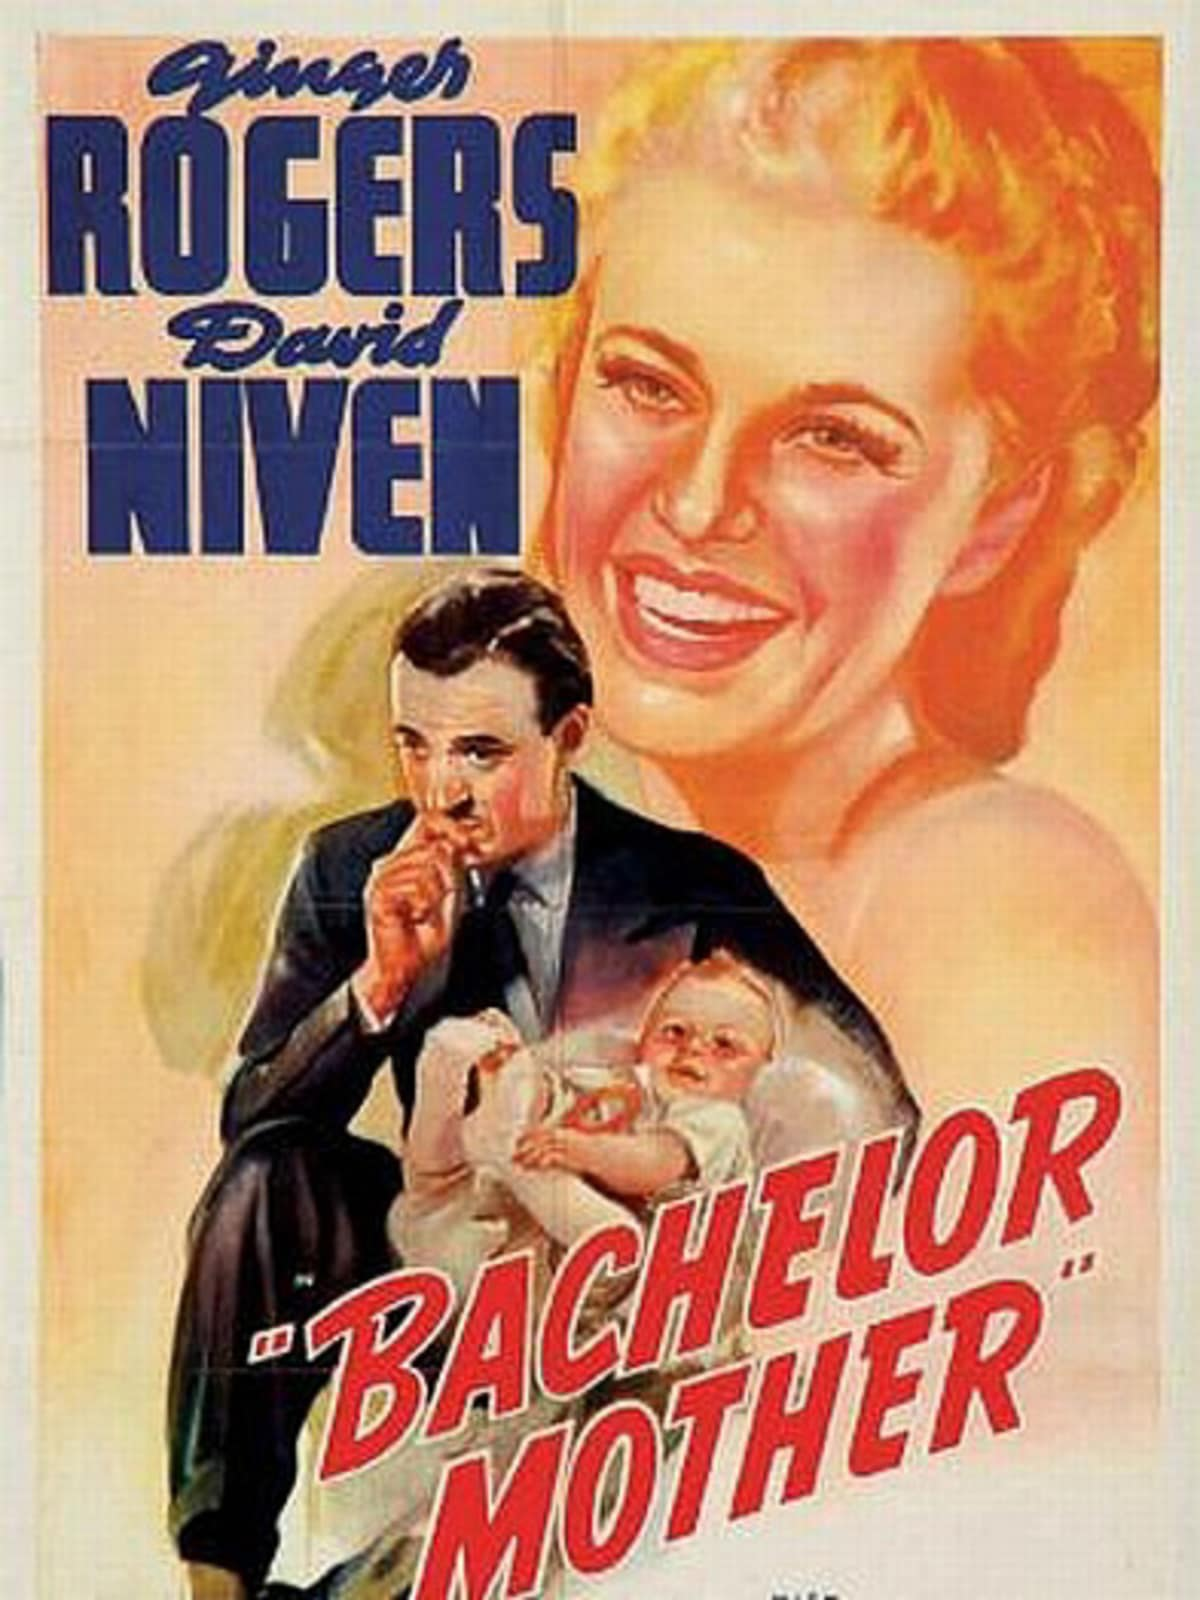 News_Sarah Gish_River Oaks Theatre_Dec. 2009_Bachelor Mother_movie poster